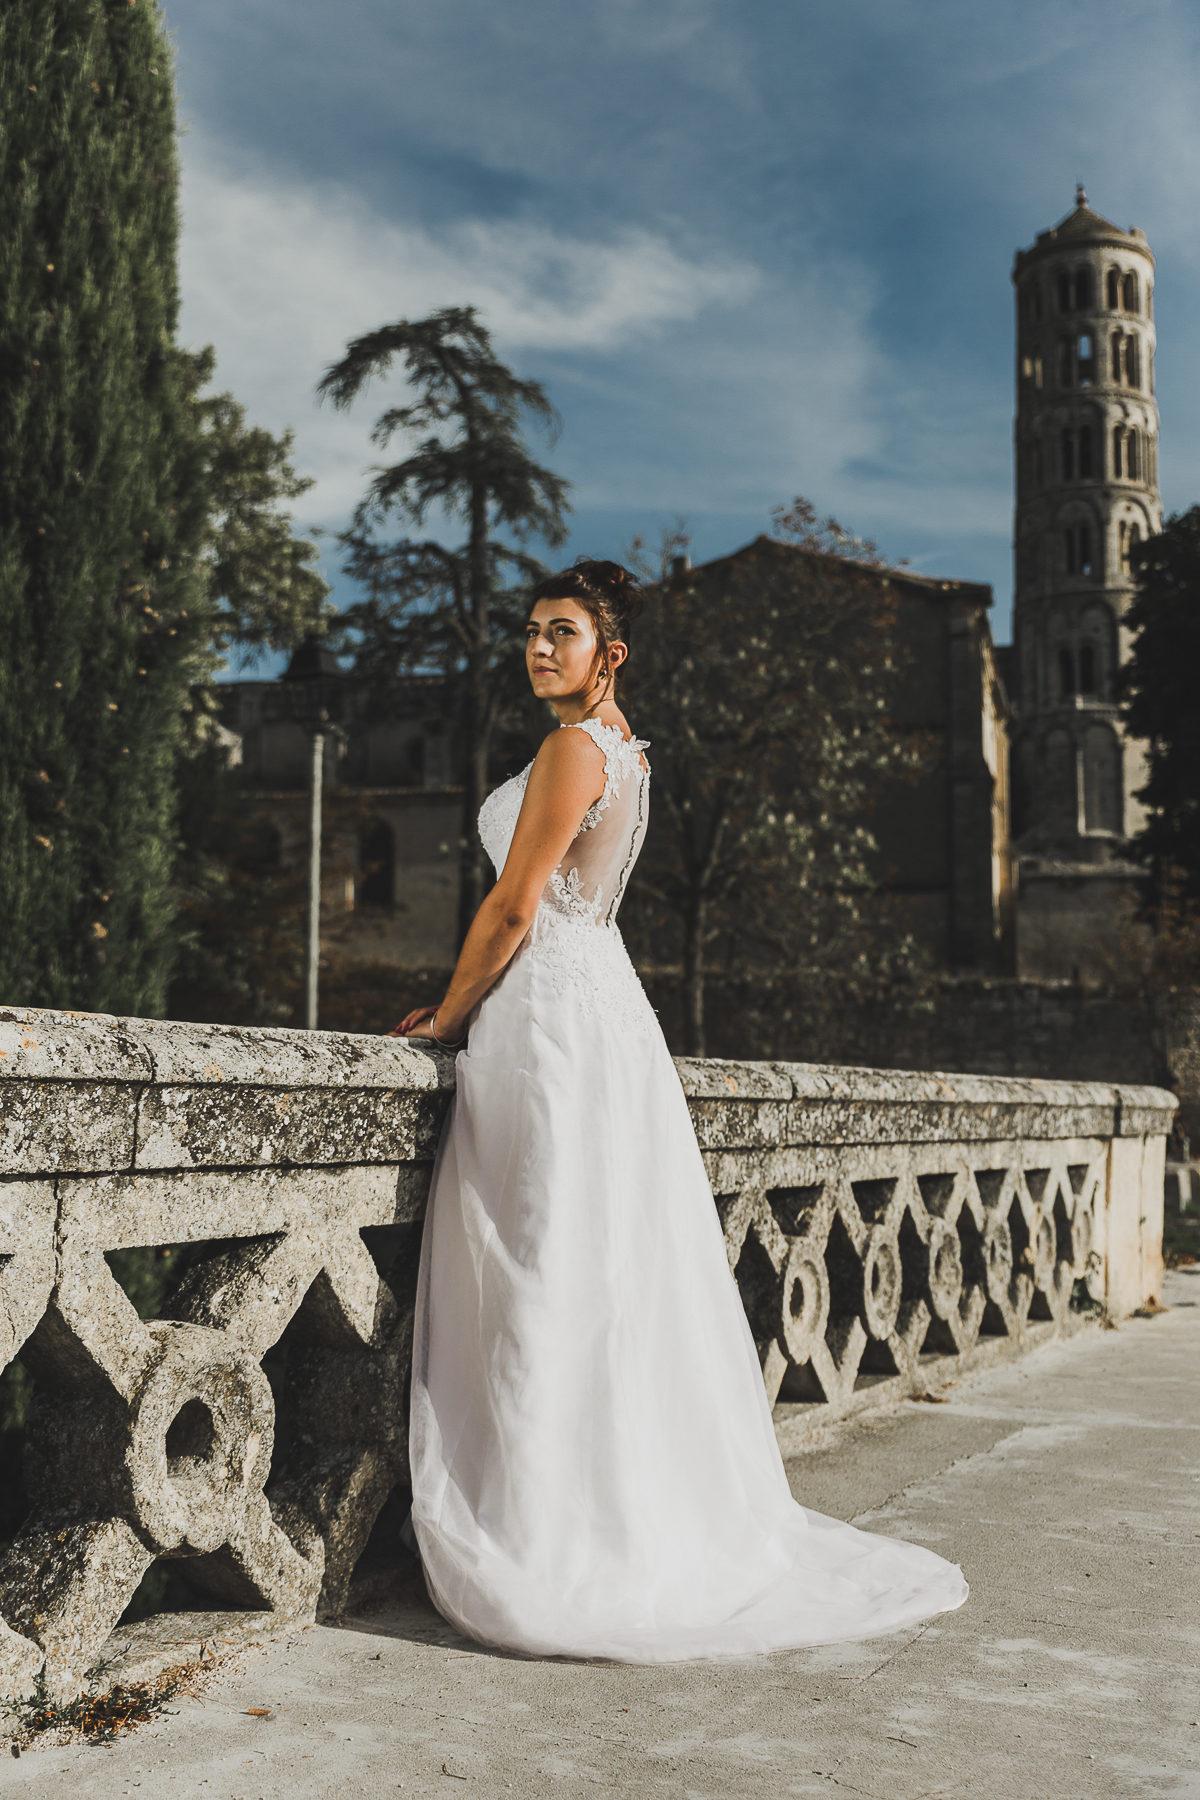 Photographe Mariage Provence, Photographe en Provence, Contactez-moi